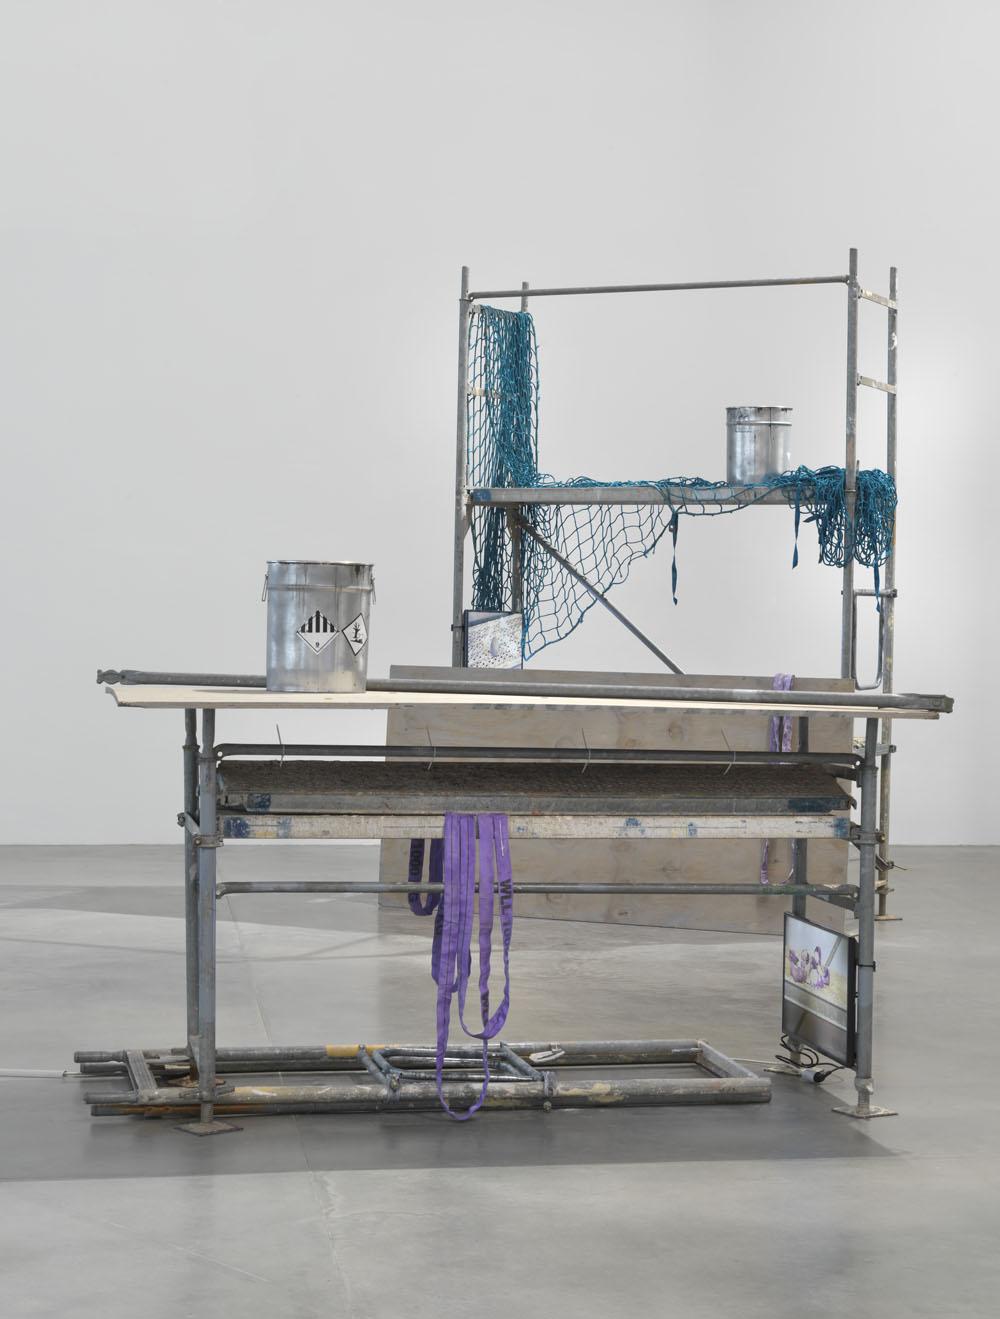 Sofia Hultén:  Unstable Fakers of Change in Self , Exhibition view KINDL – Centre for Contemporary Art; © Sofia Hultén / VG BILD-KUNST, Bonn, 2018; Photo: Jens Ziehe, 2018